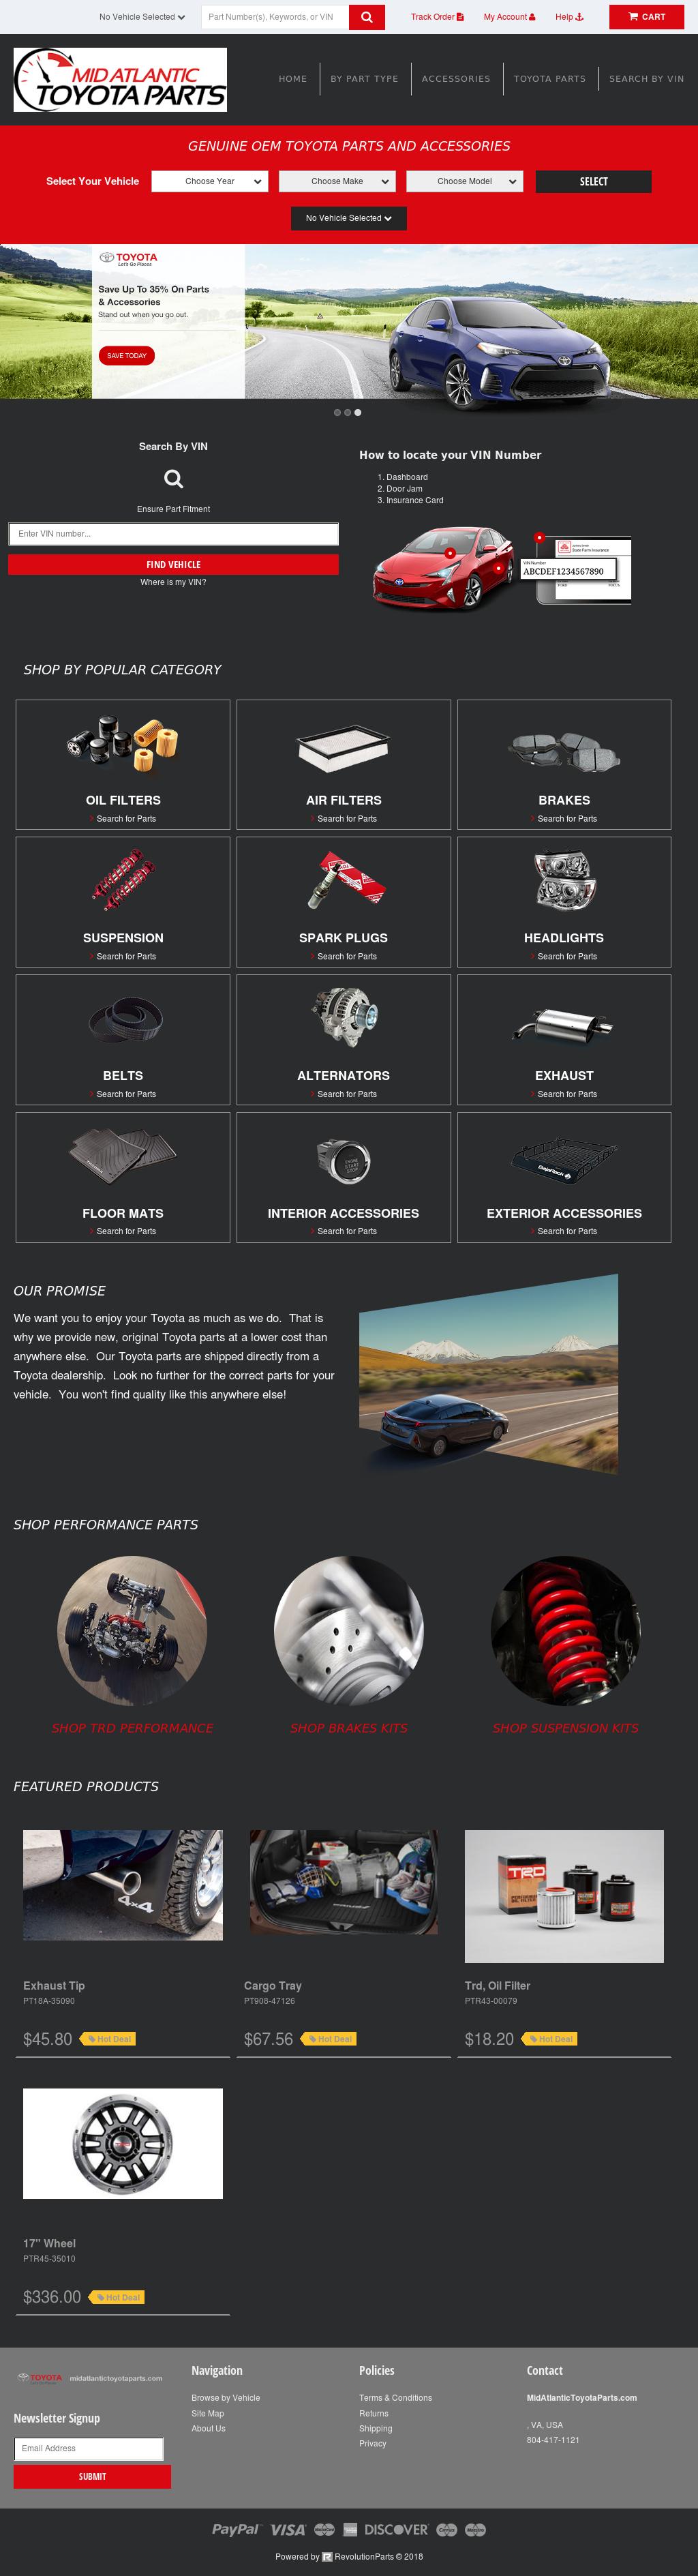 Beautiful Mid Atlantic Toyota Parts Website History